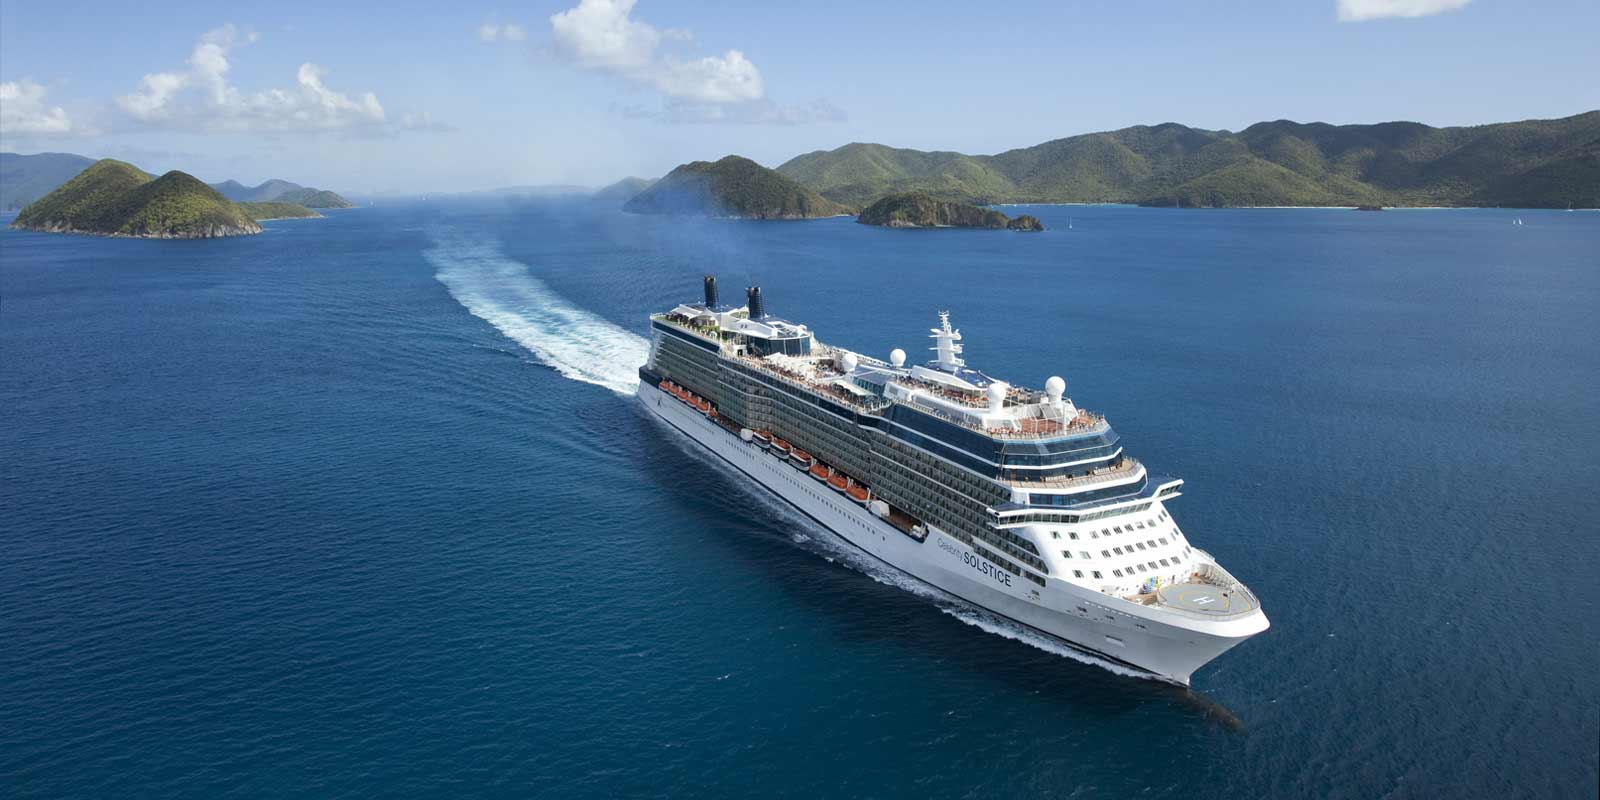 Celebrity Solstice kryssningsfartyg